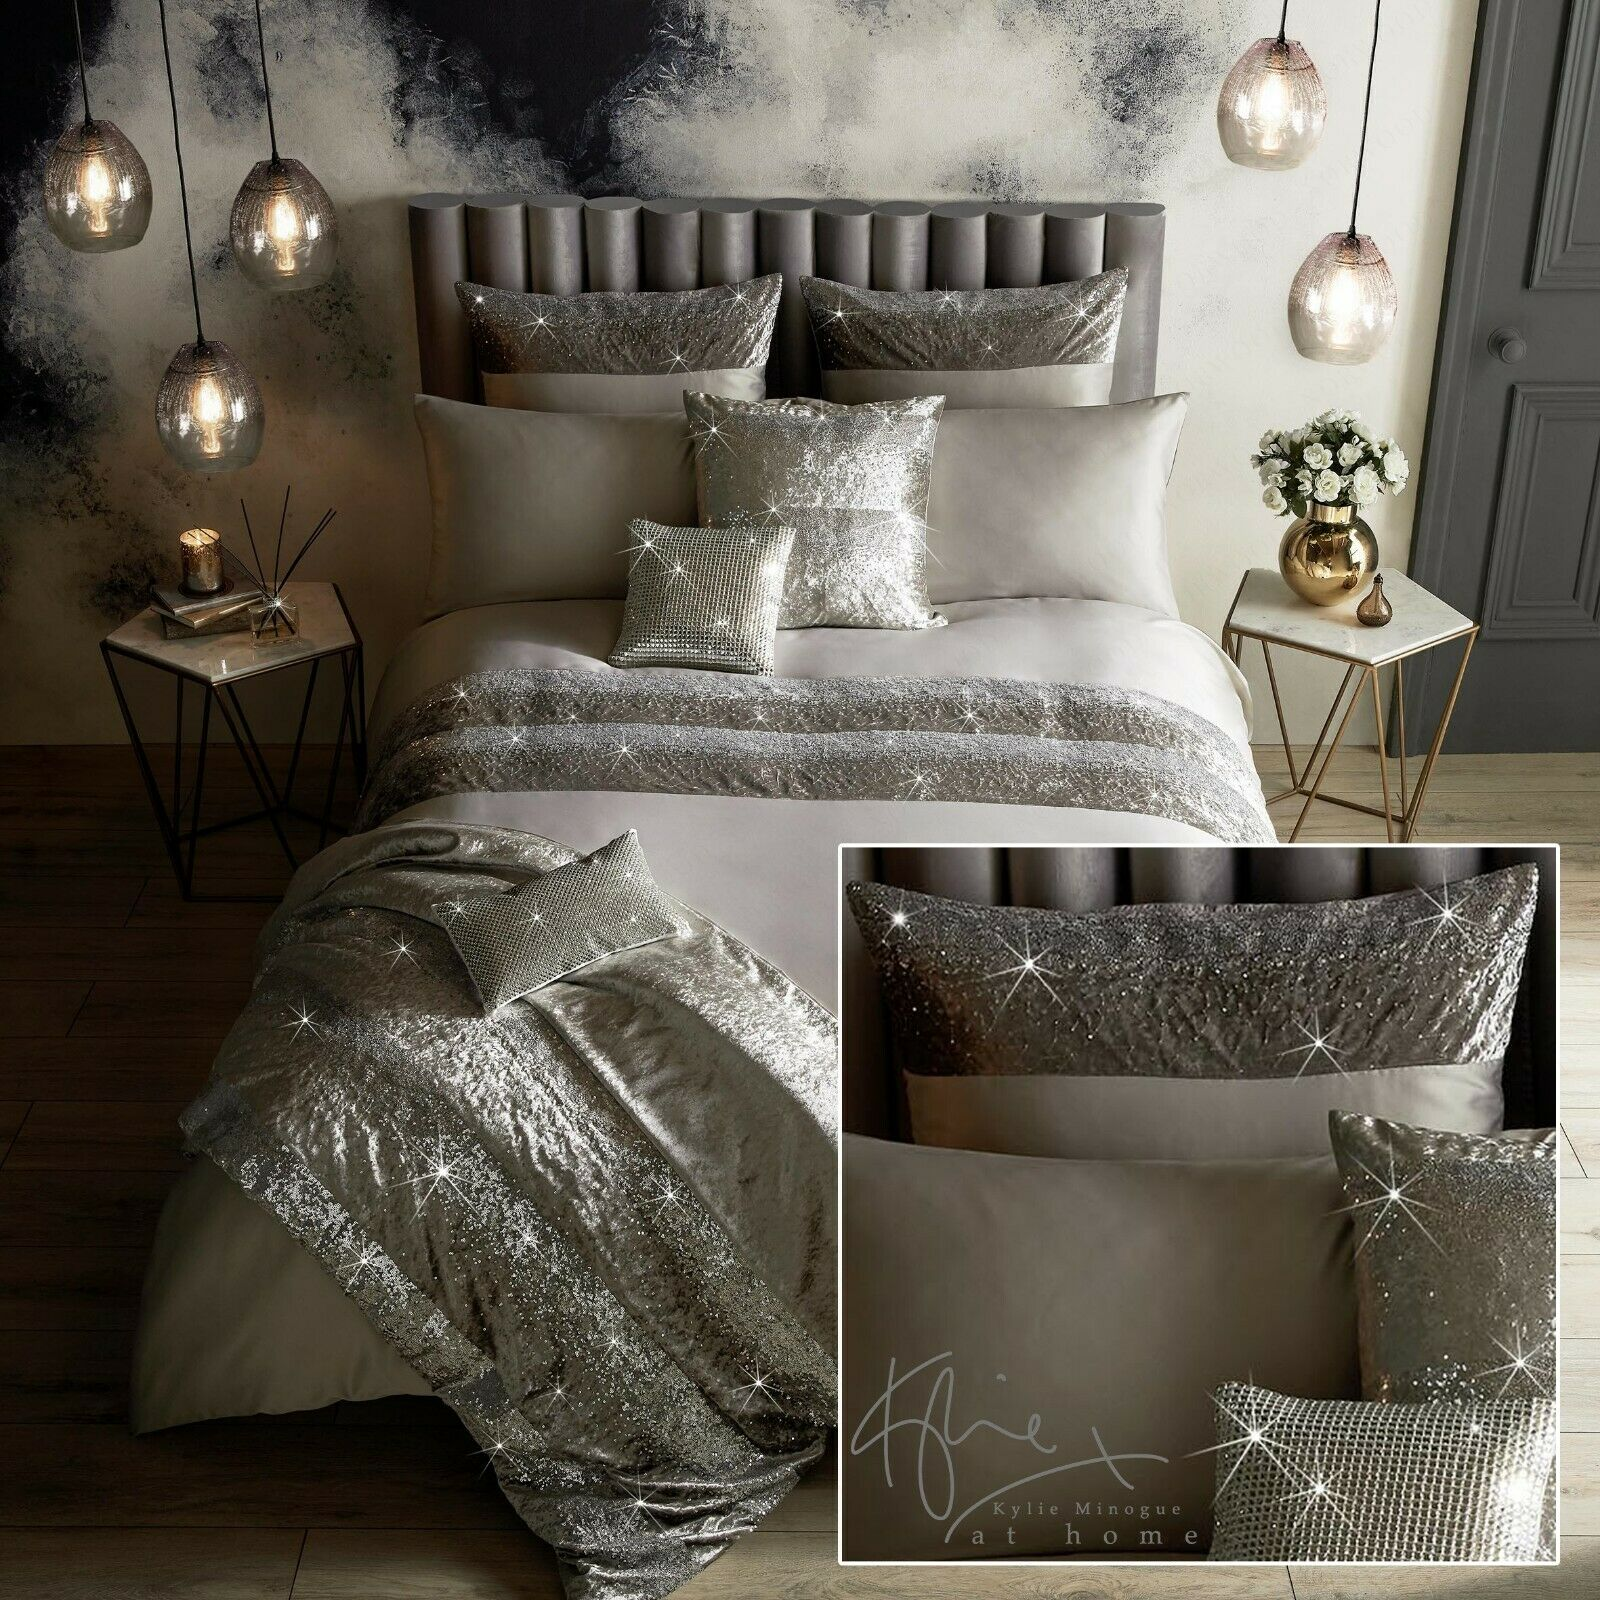 Kylie Minogue Bedding SKYLA Silber Duvet   Comforter Cover, Cushions or Throw